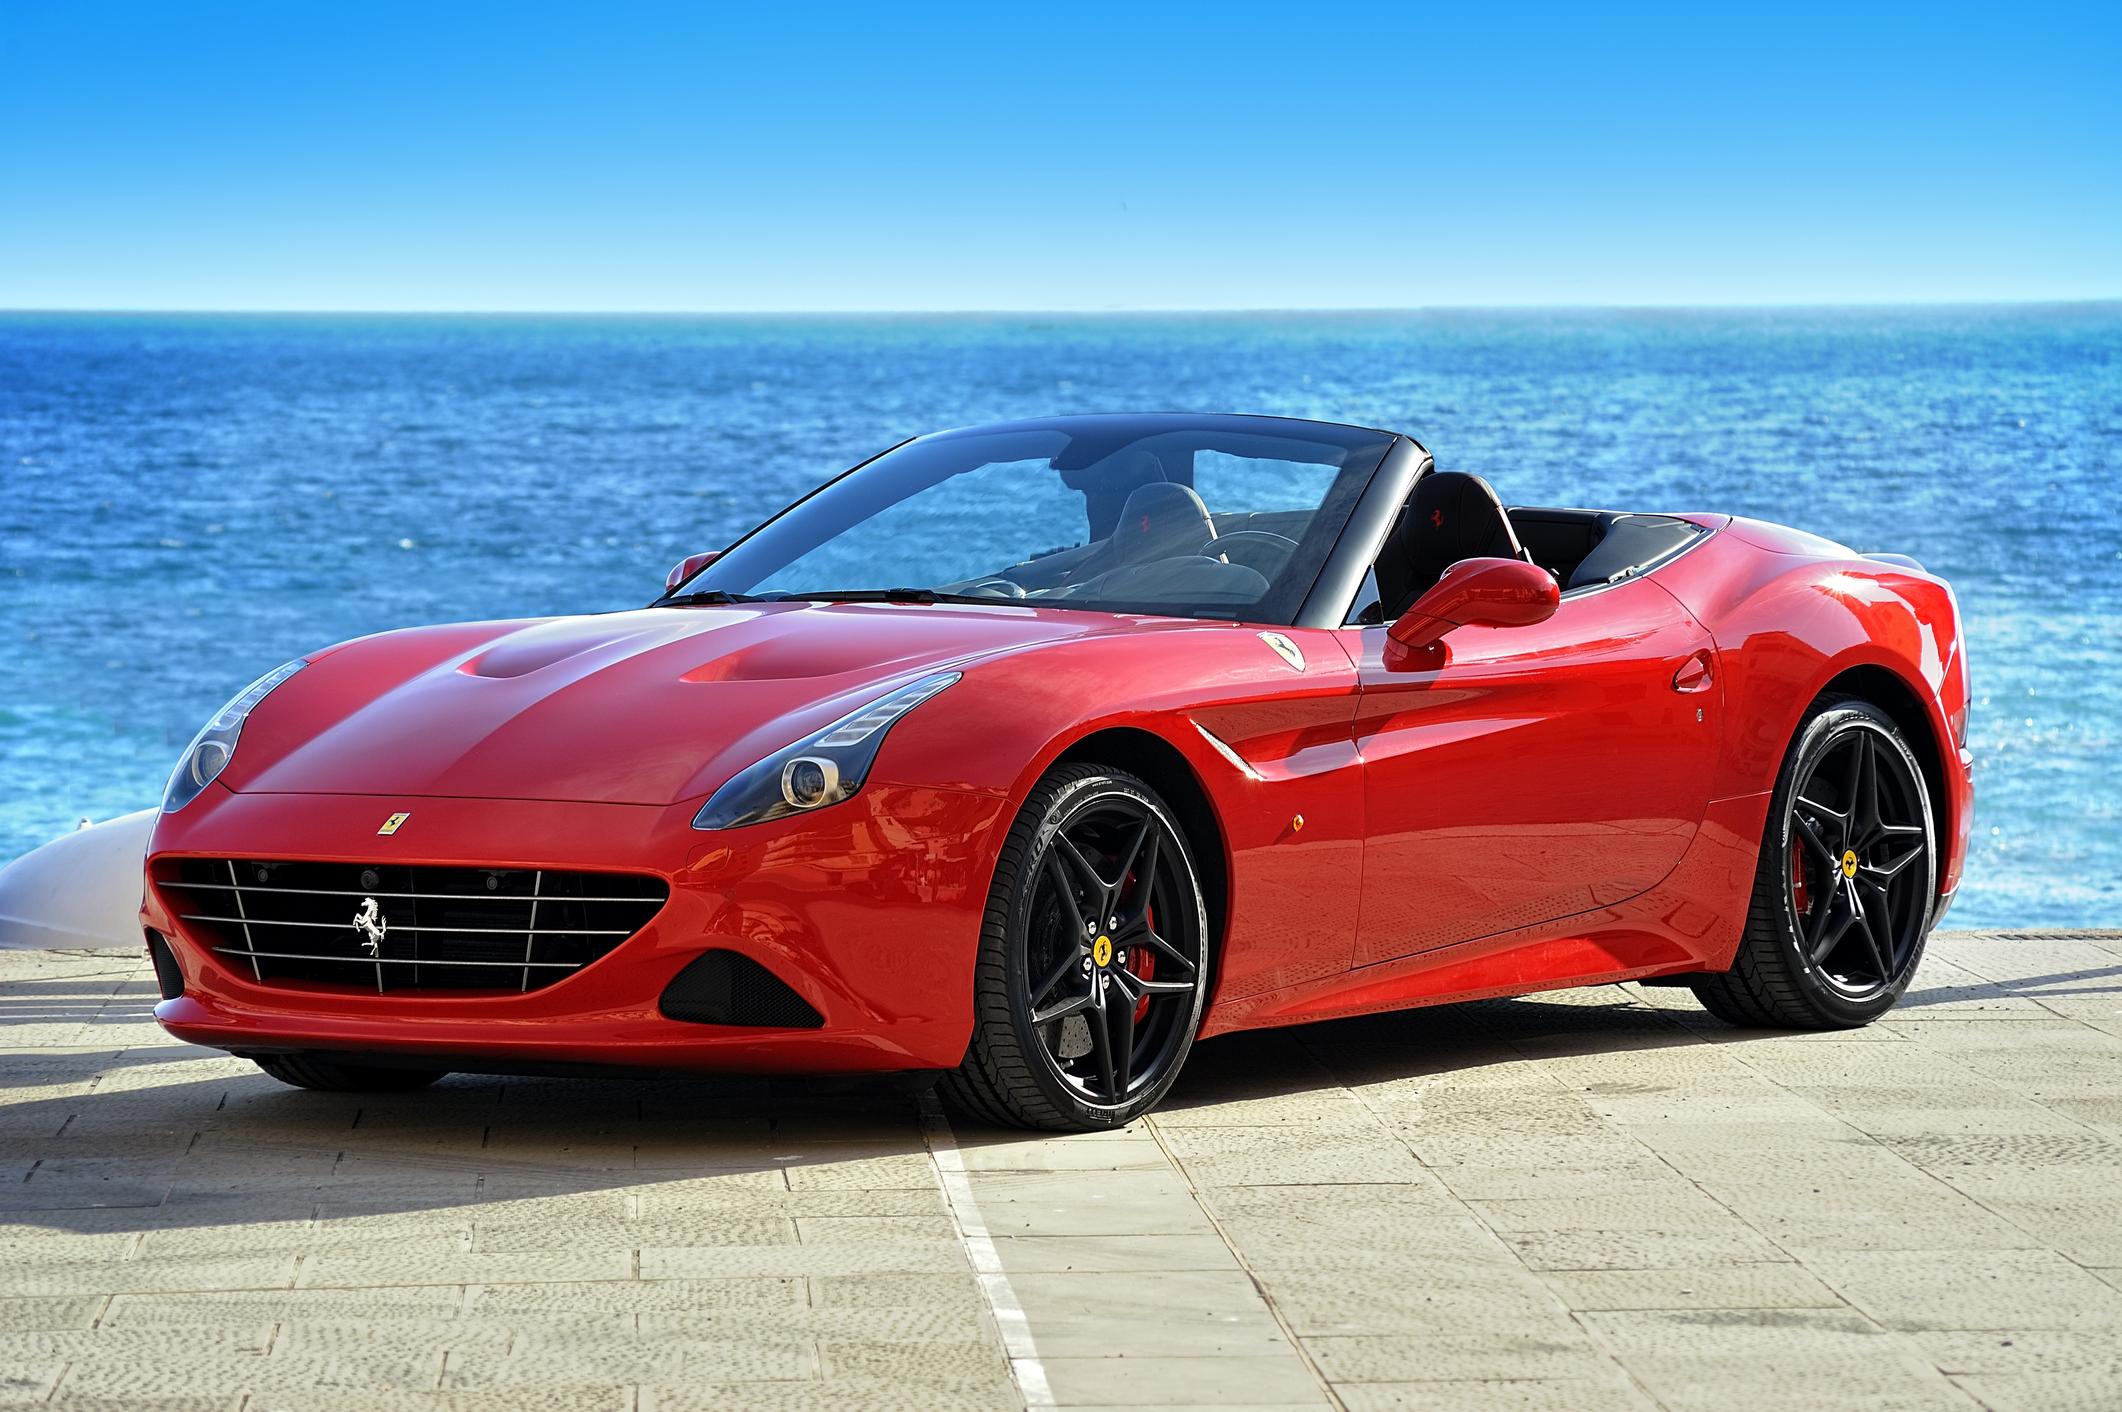 Ferrari California T Handling Speciale on the waterfront of the Mediterranean Sea in Camogli.